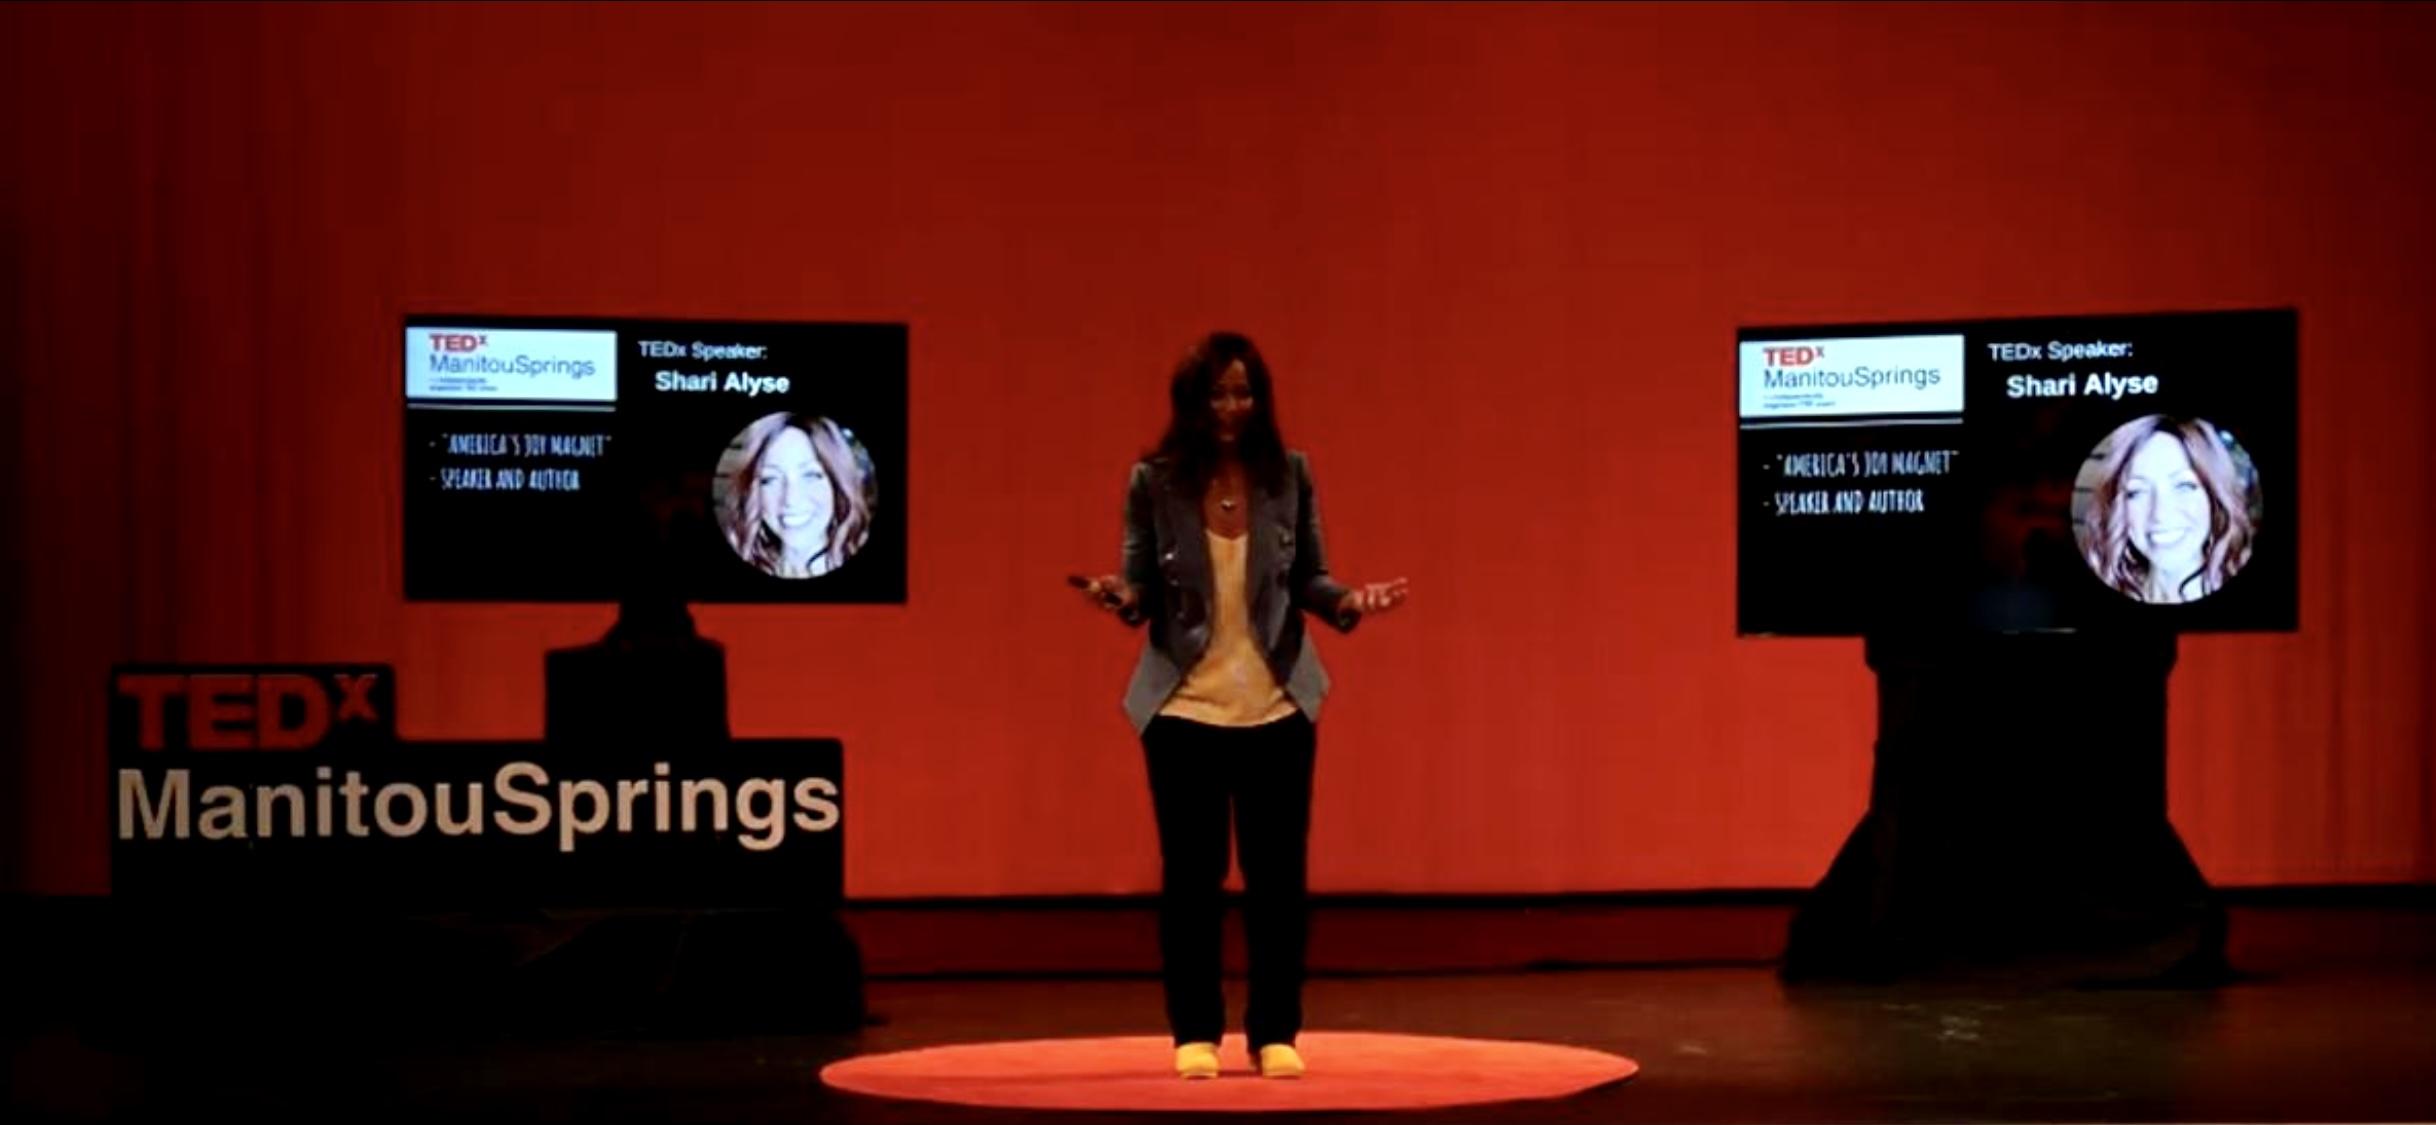 speaking at TEDx